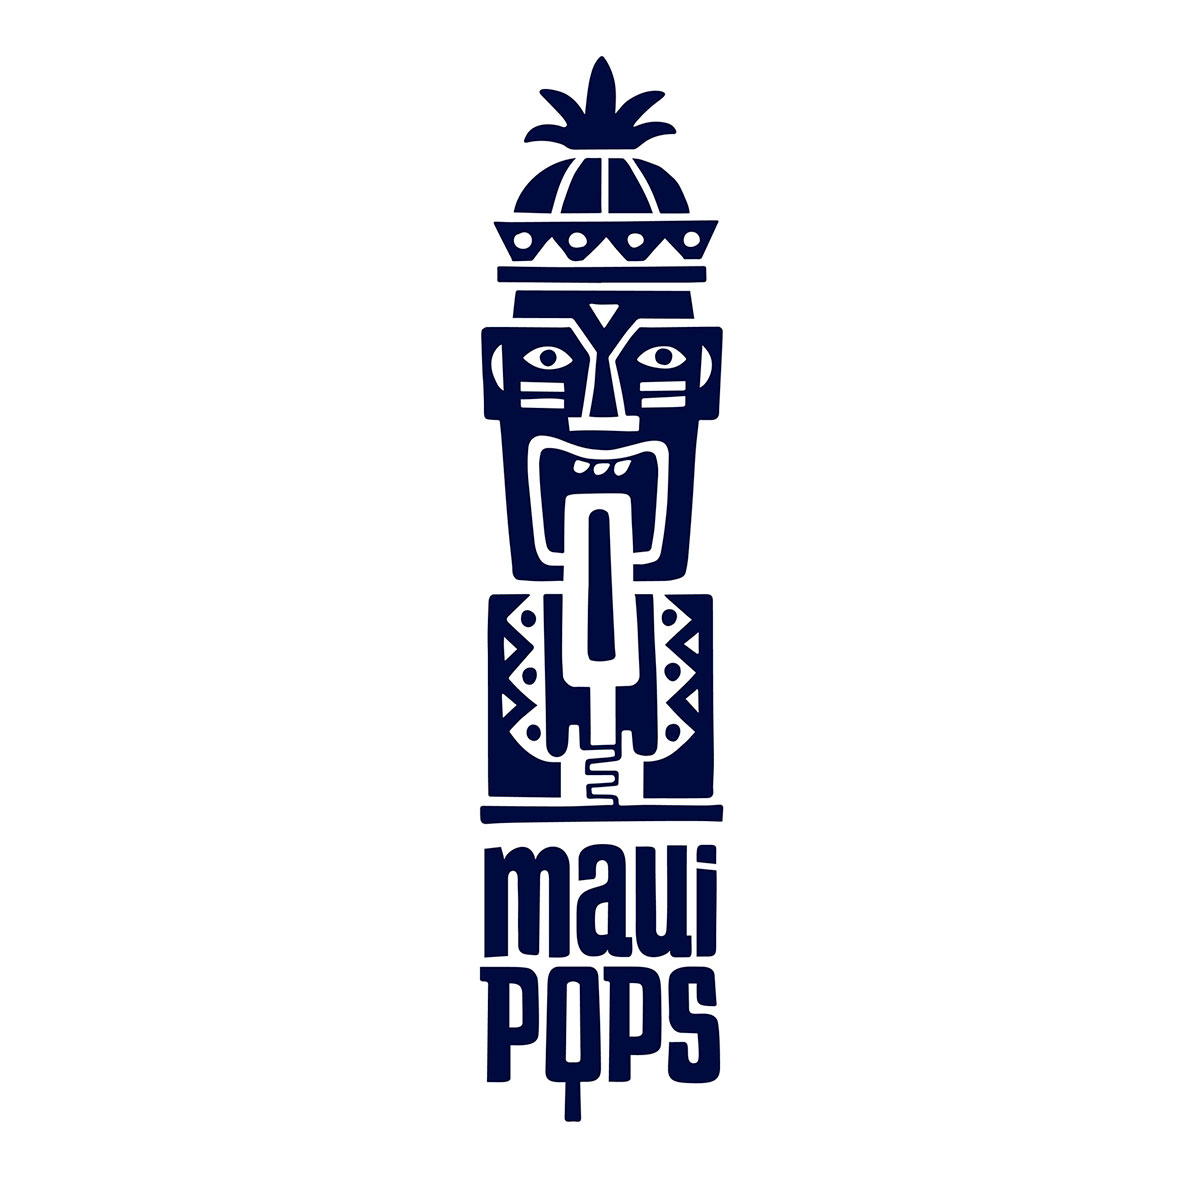 Maui Pops identity